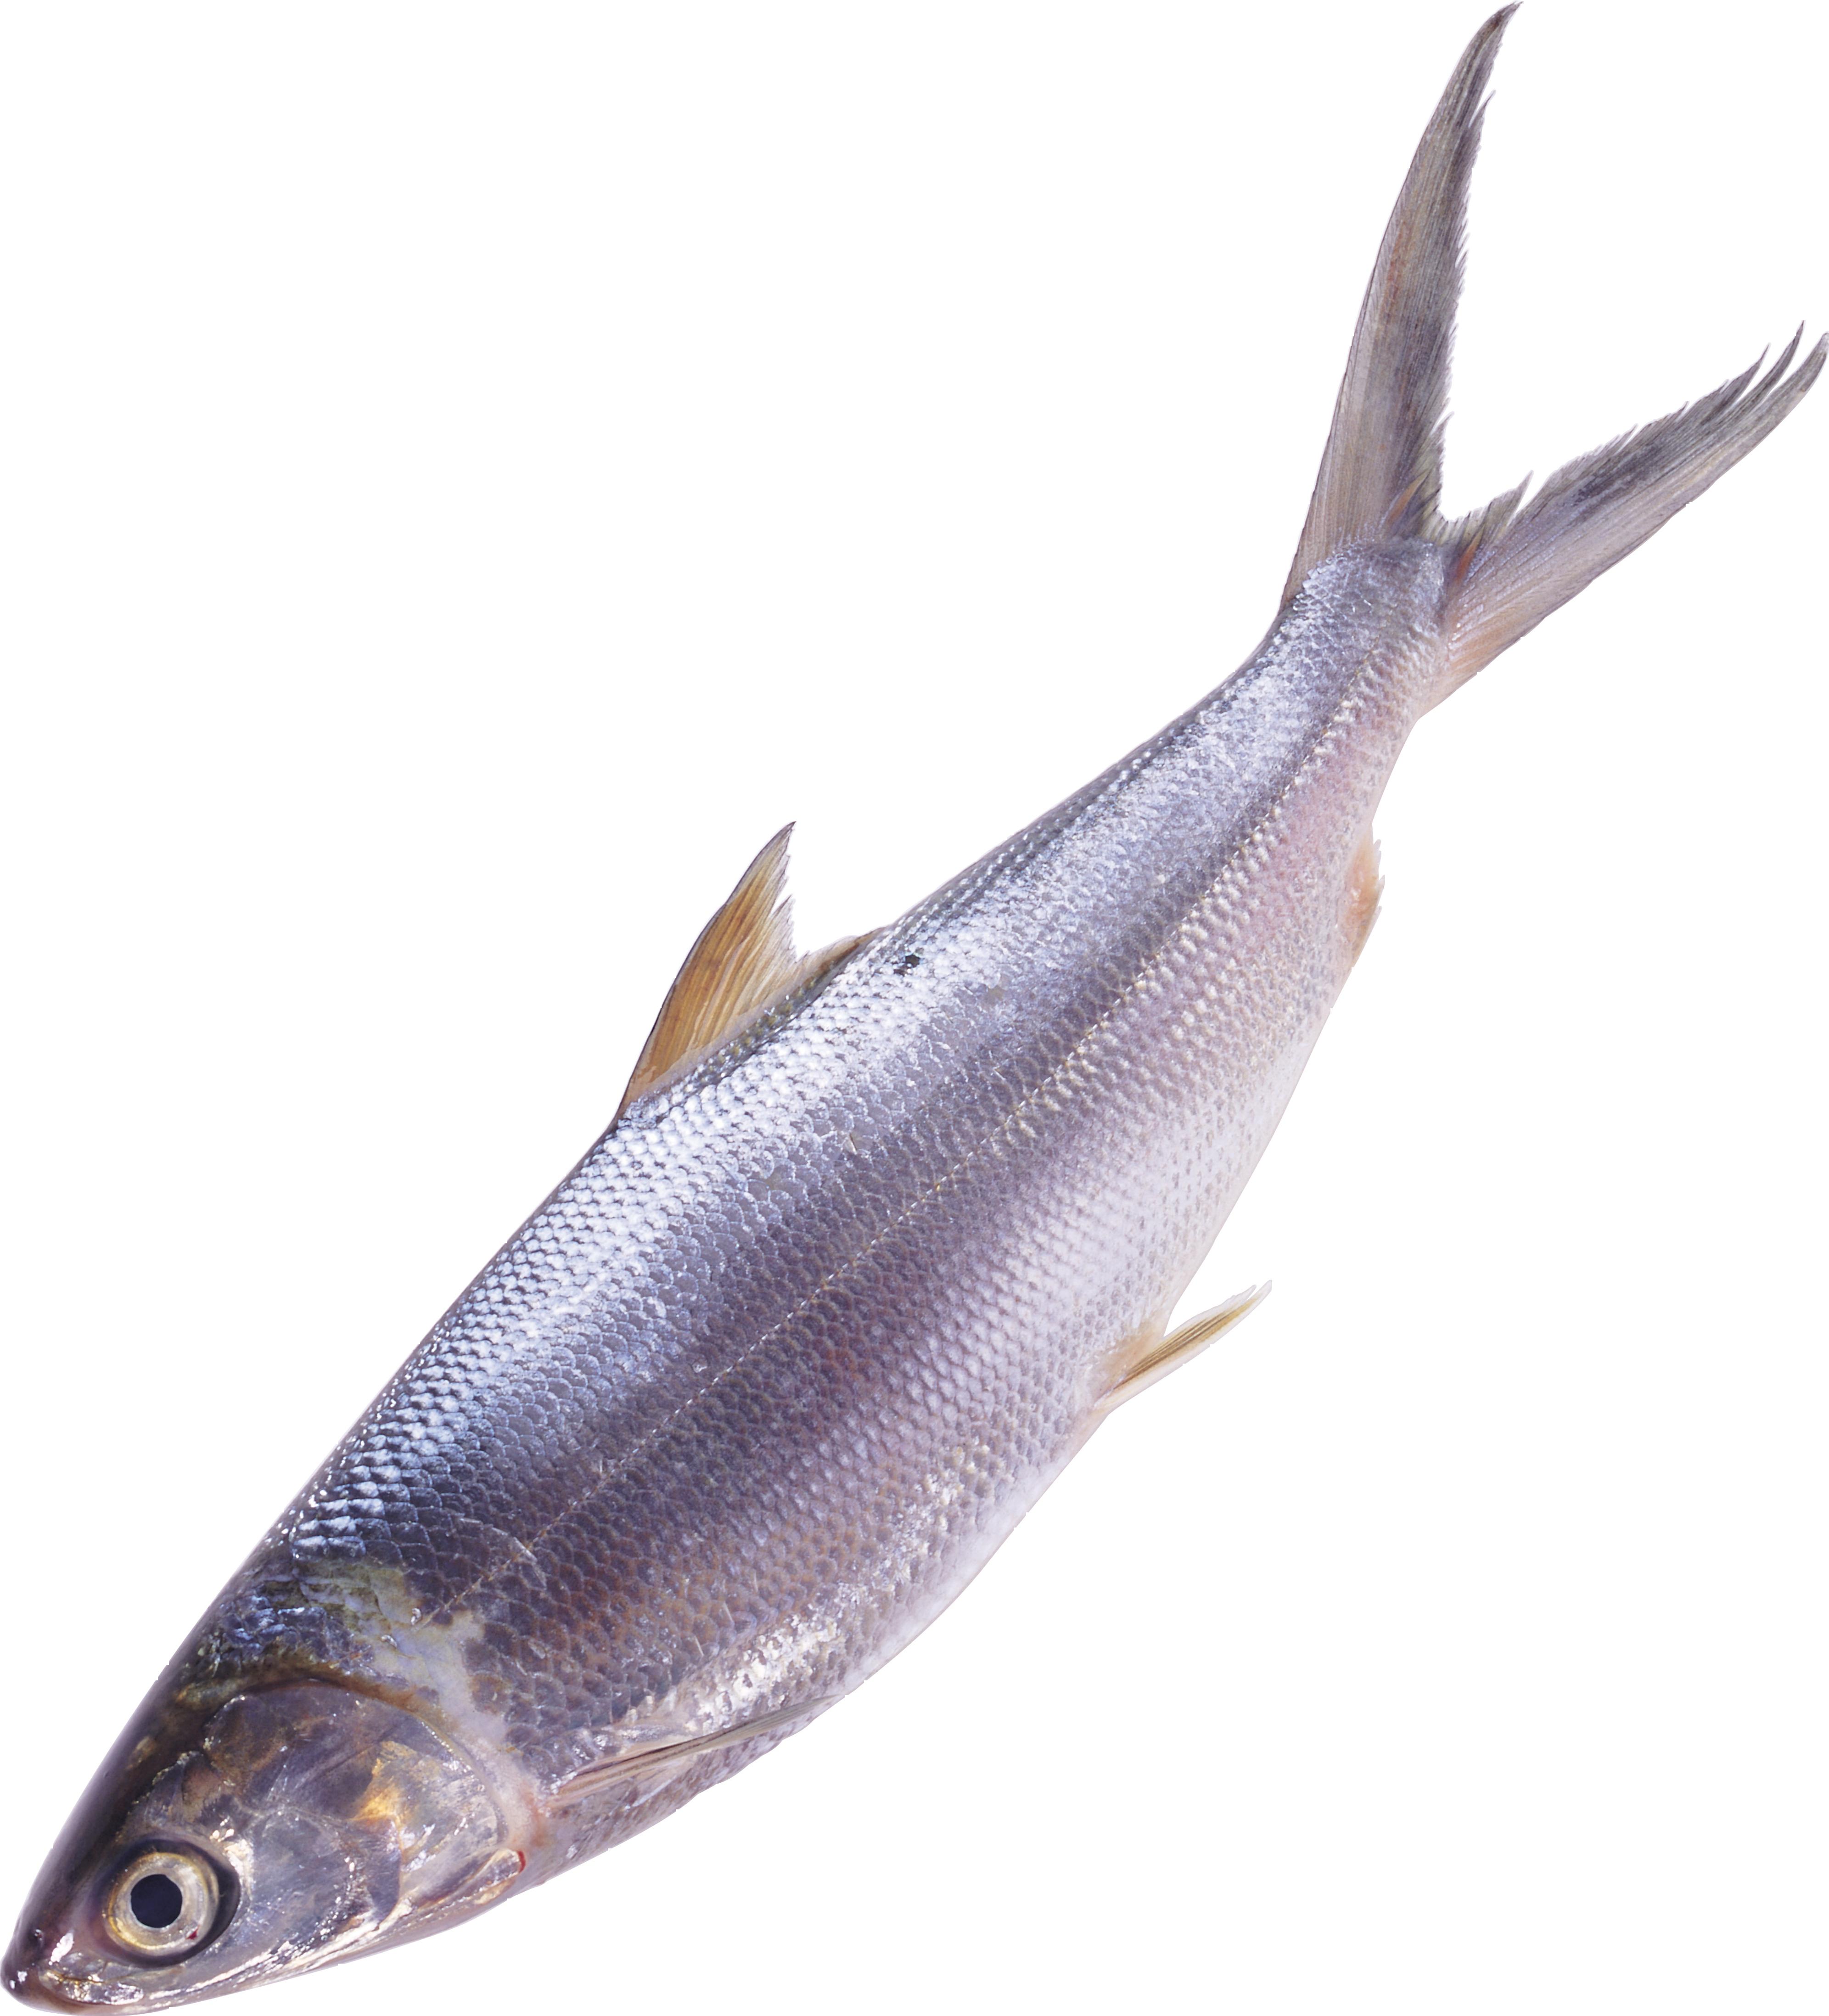 Tuna clipart amberjack. Fish png image free